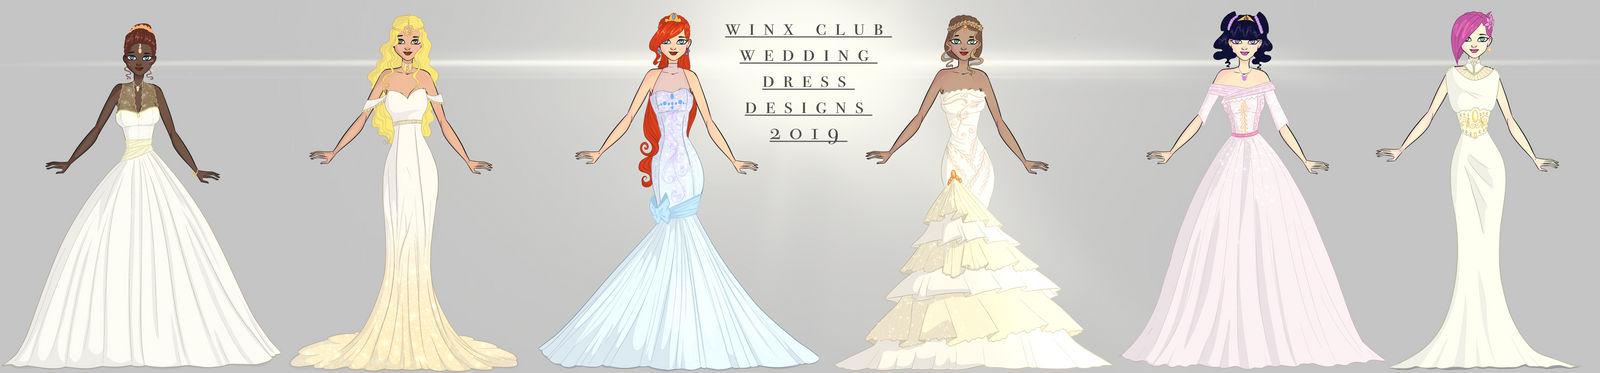 Winx club all weddingdress design